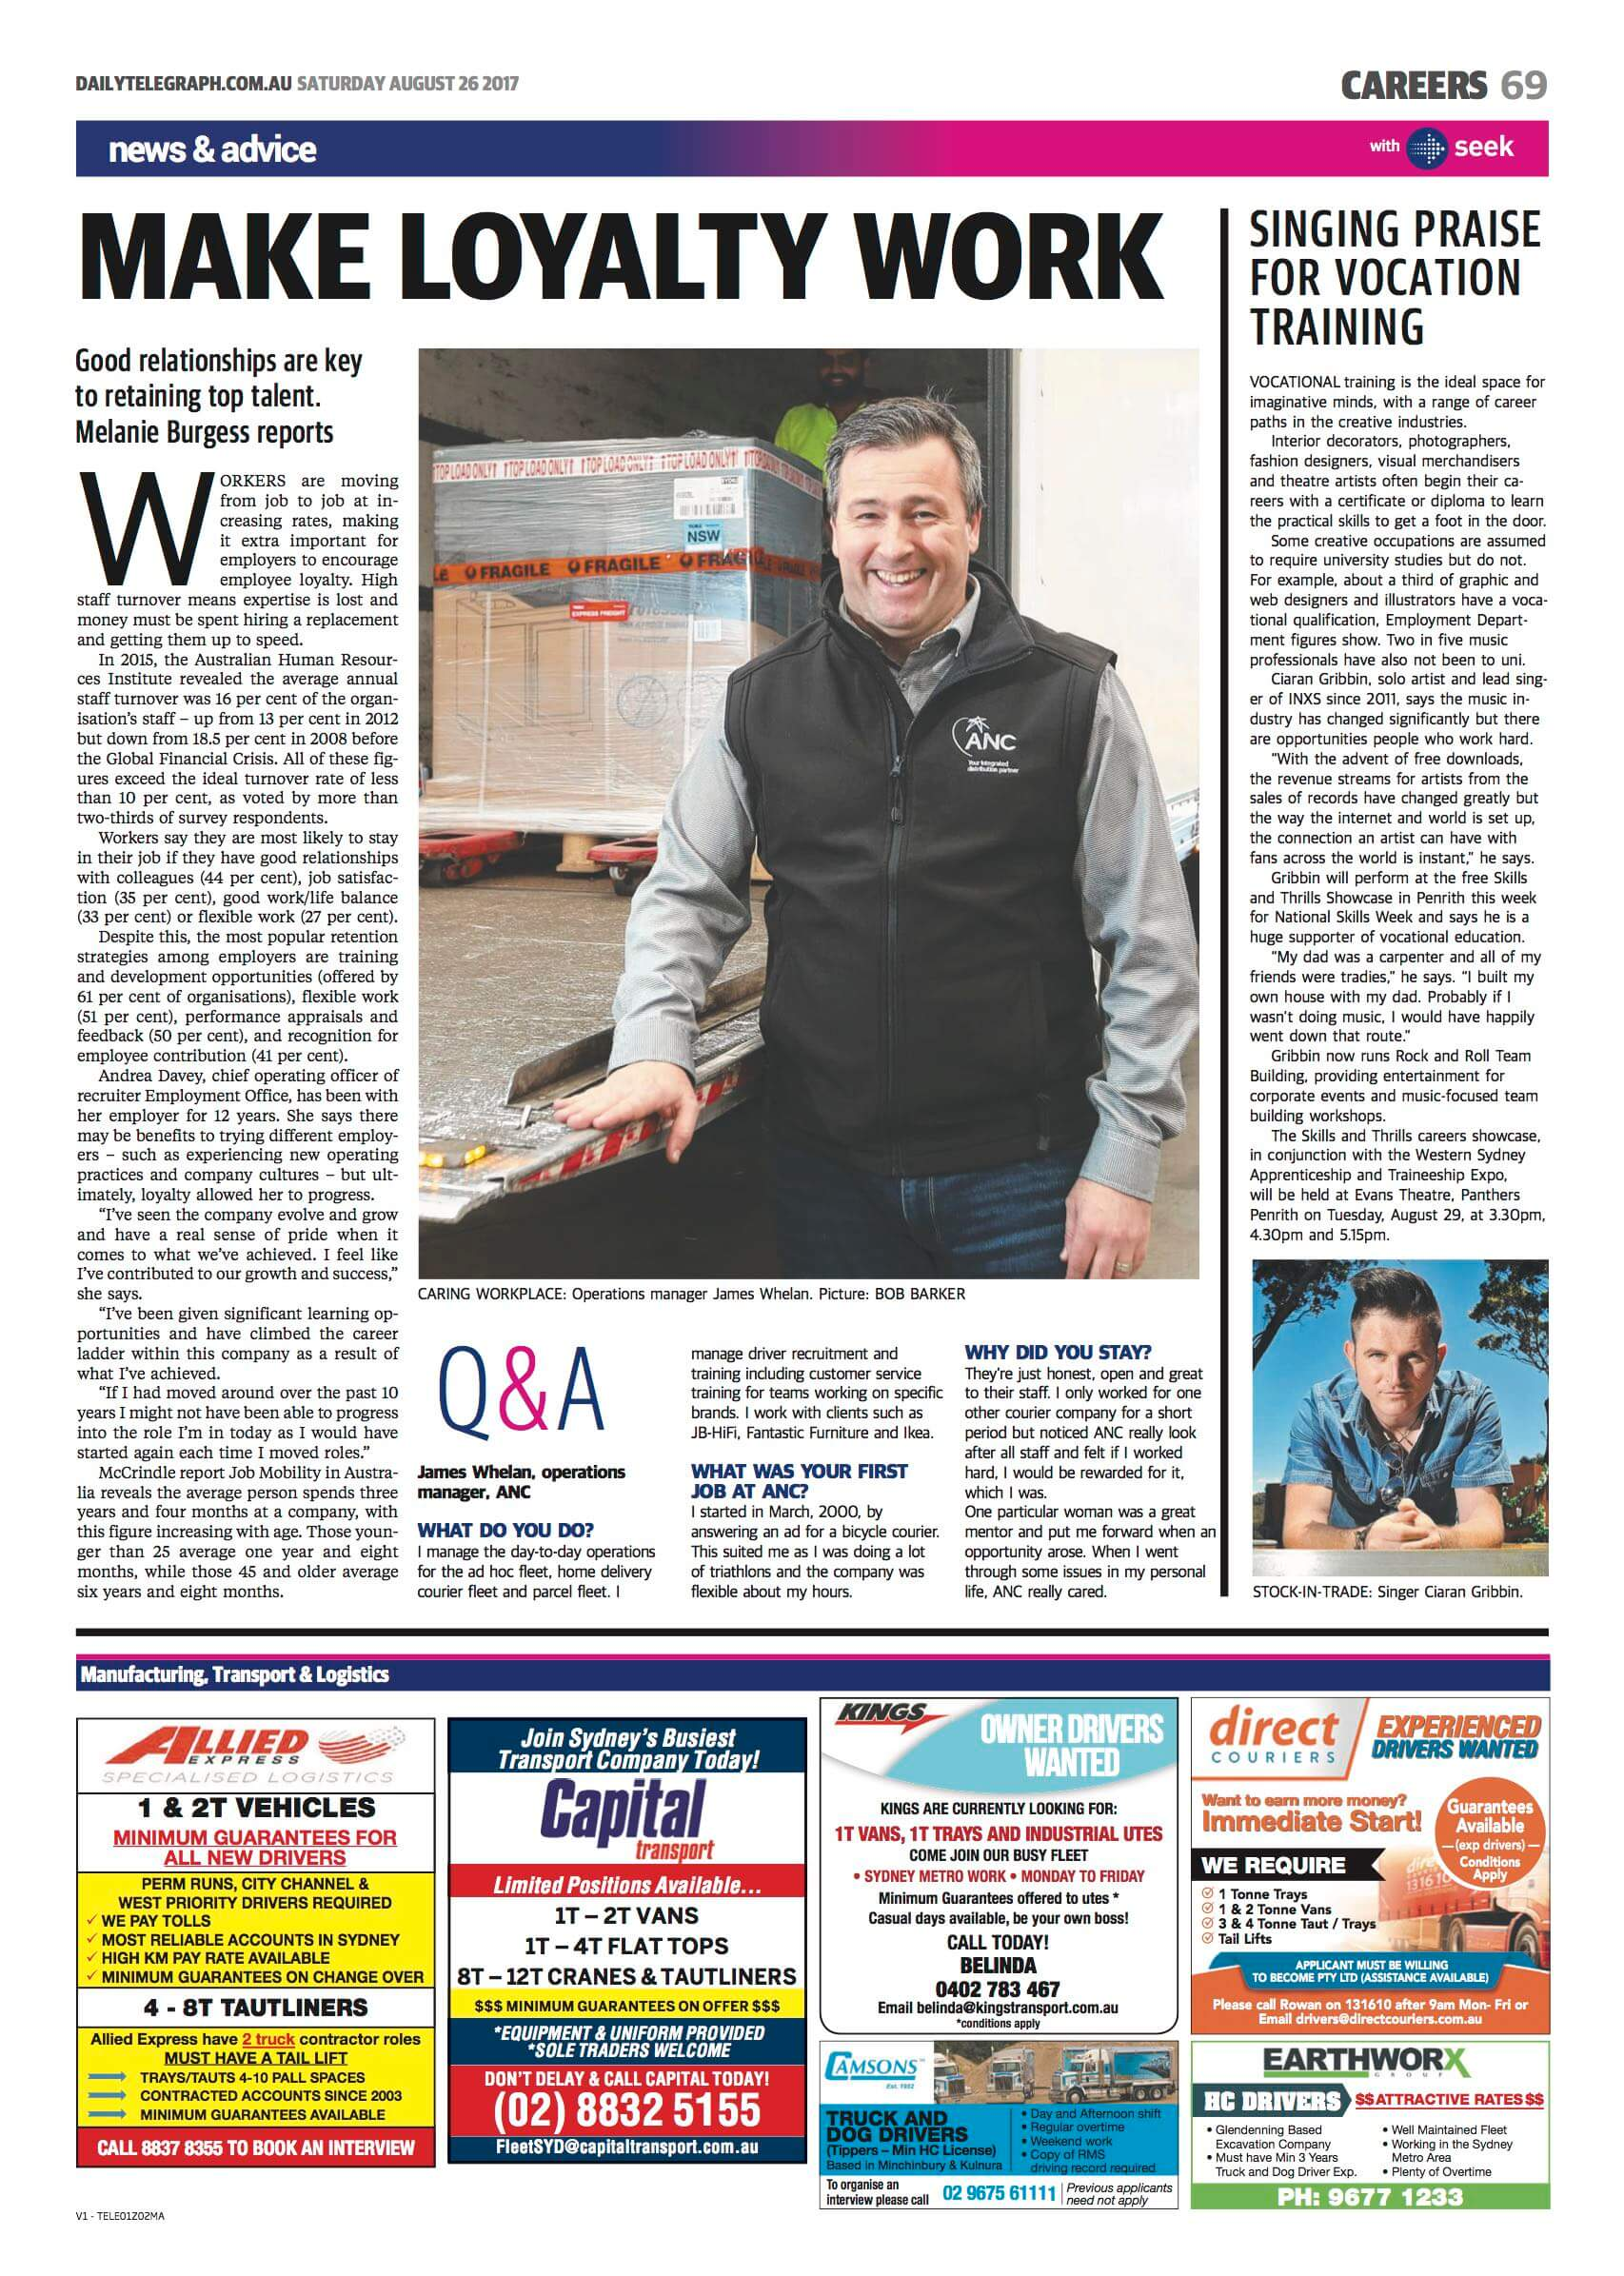 Daily Telegraph James Whelan CareersOne interview